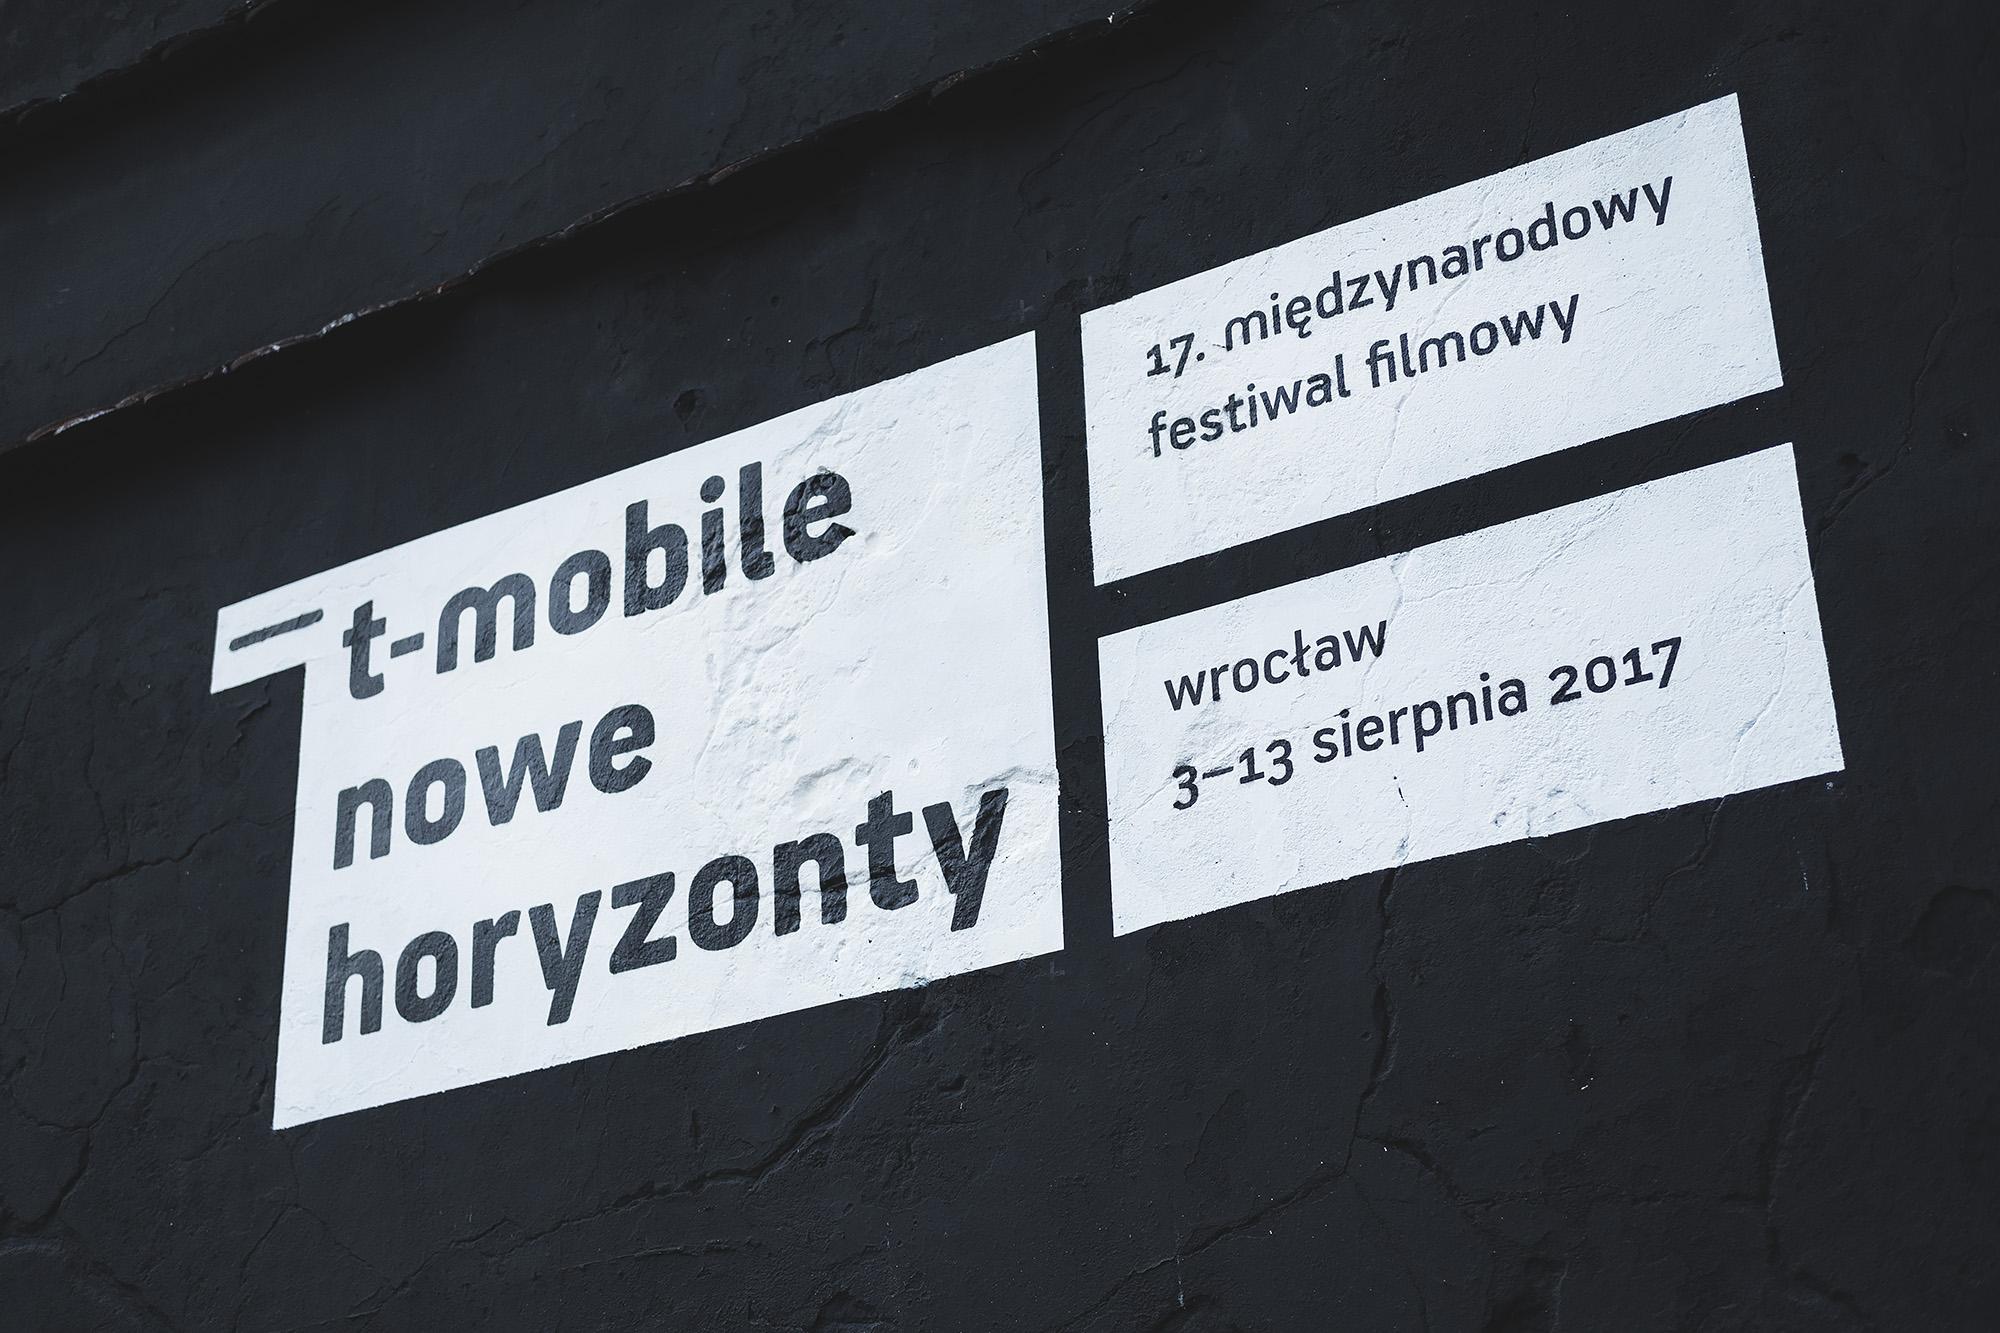 MERCEDES – NOWE HORYZONTY - 4